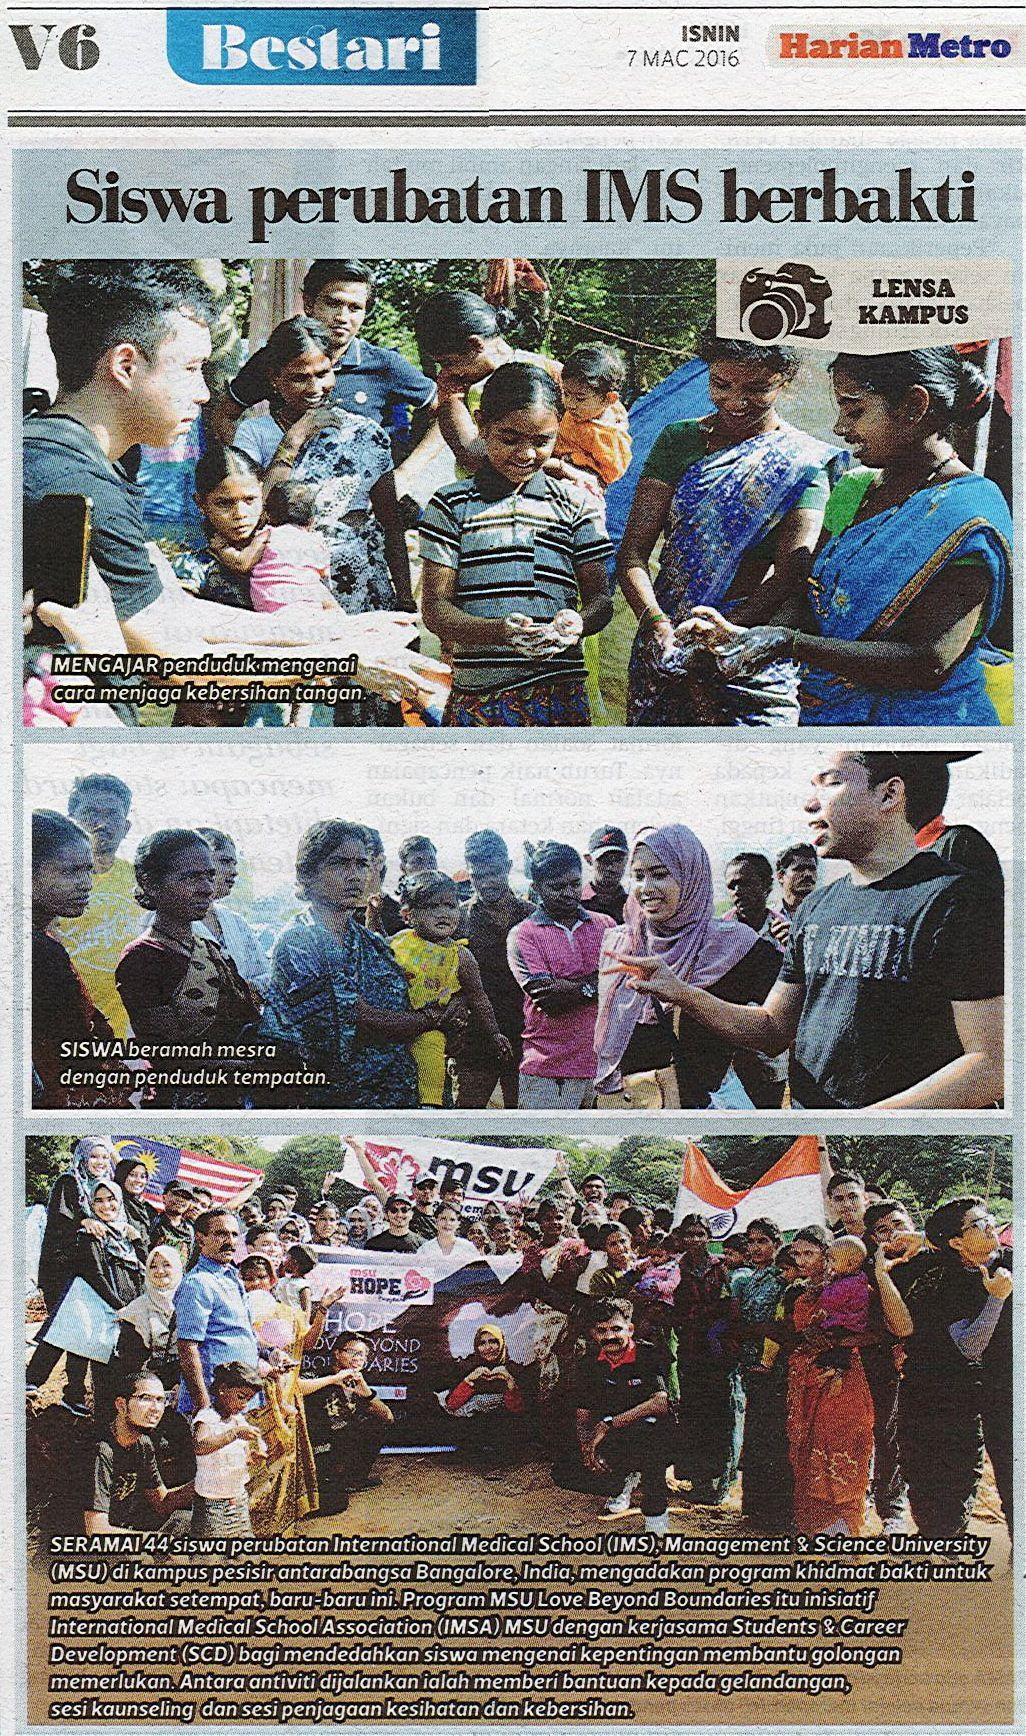 MSU Love Beyond Boundaries program in Bangalore, India